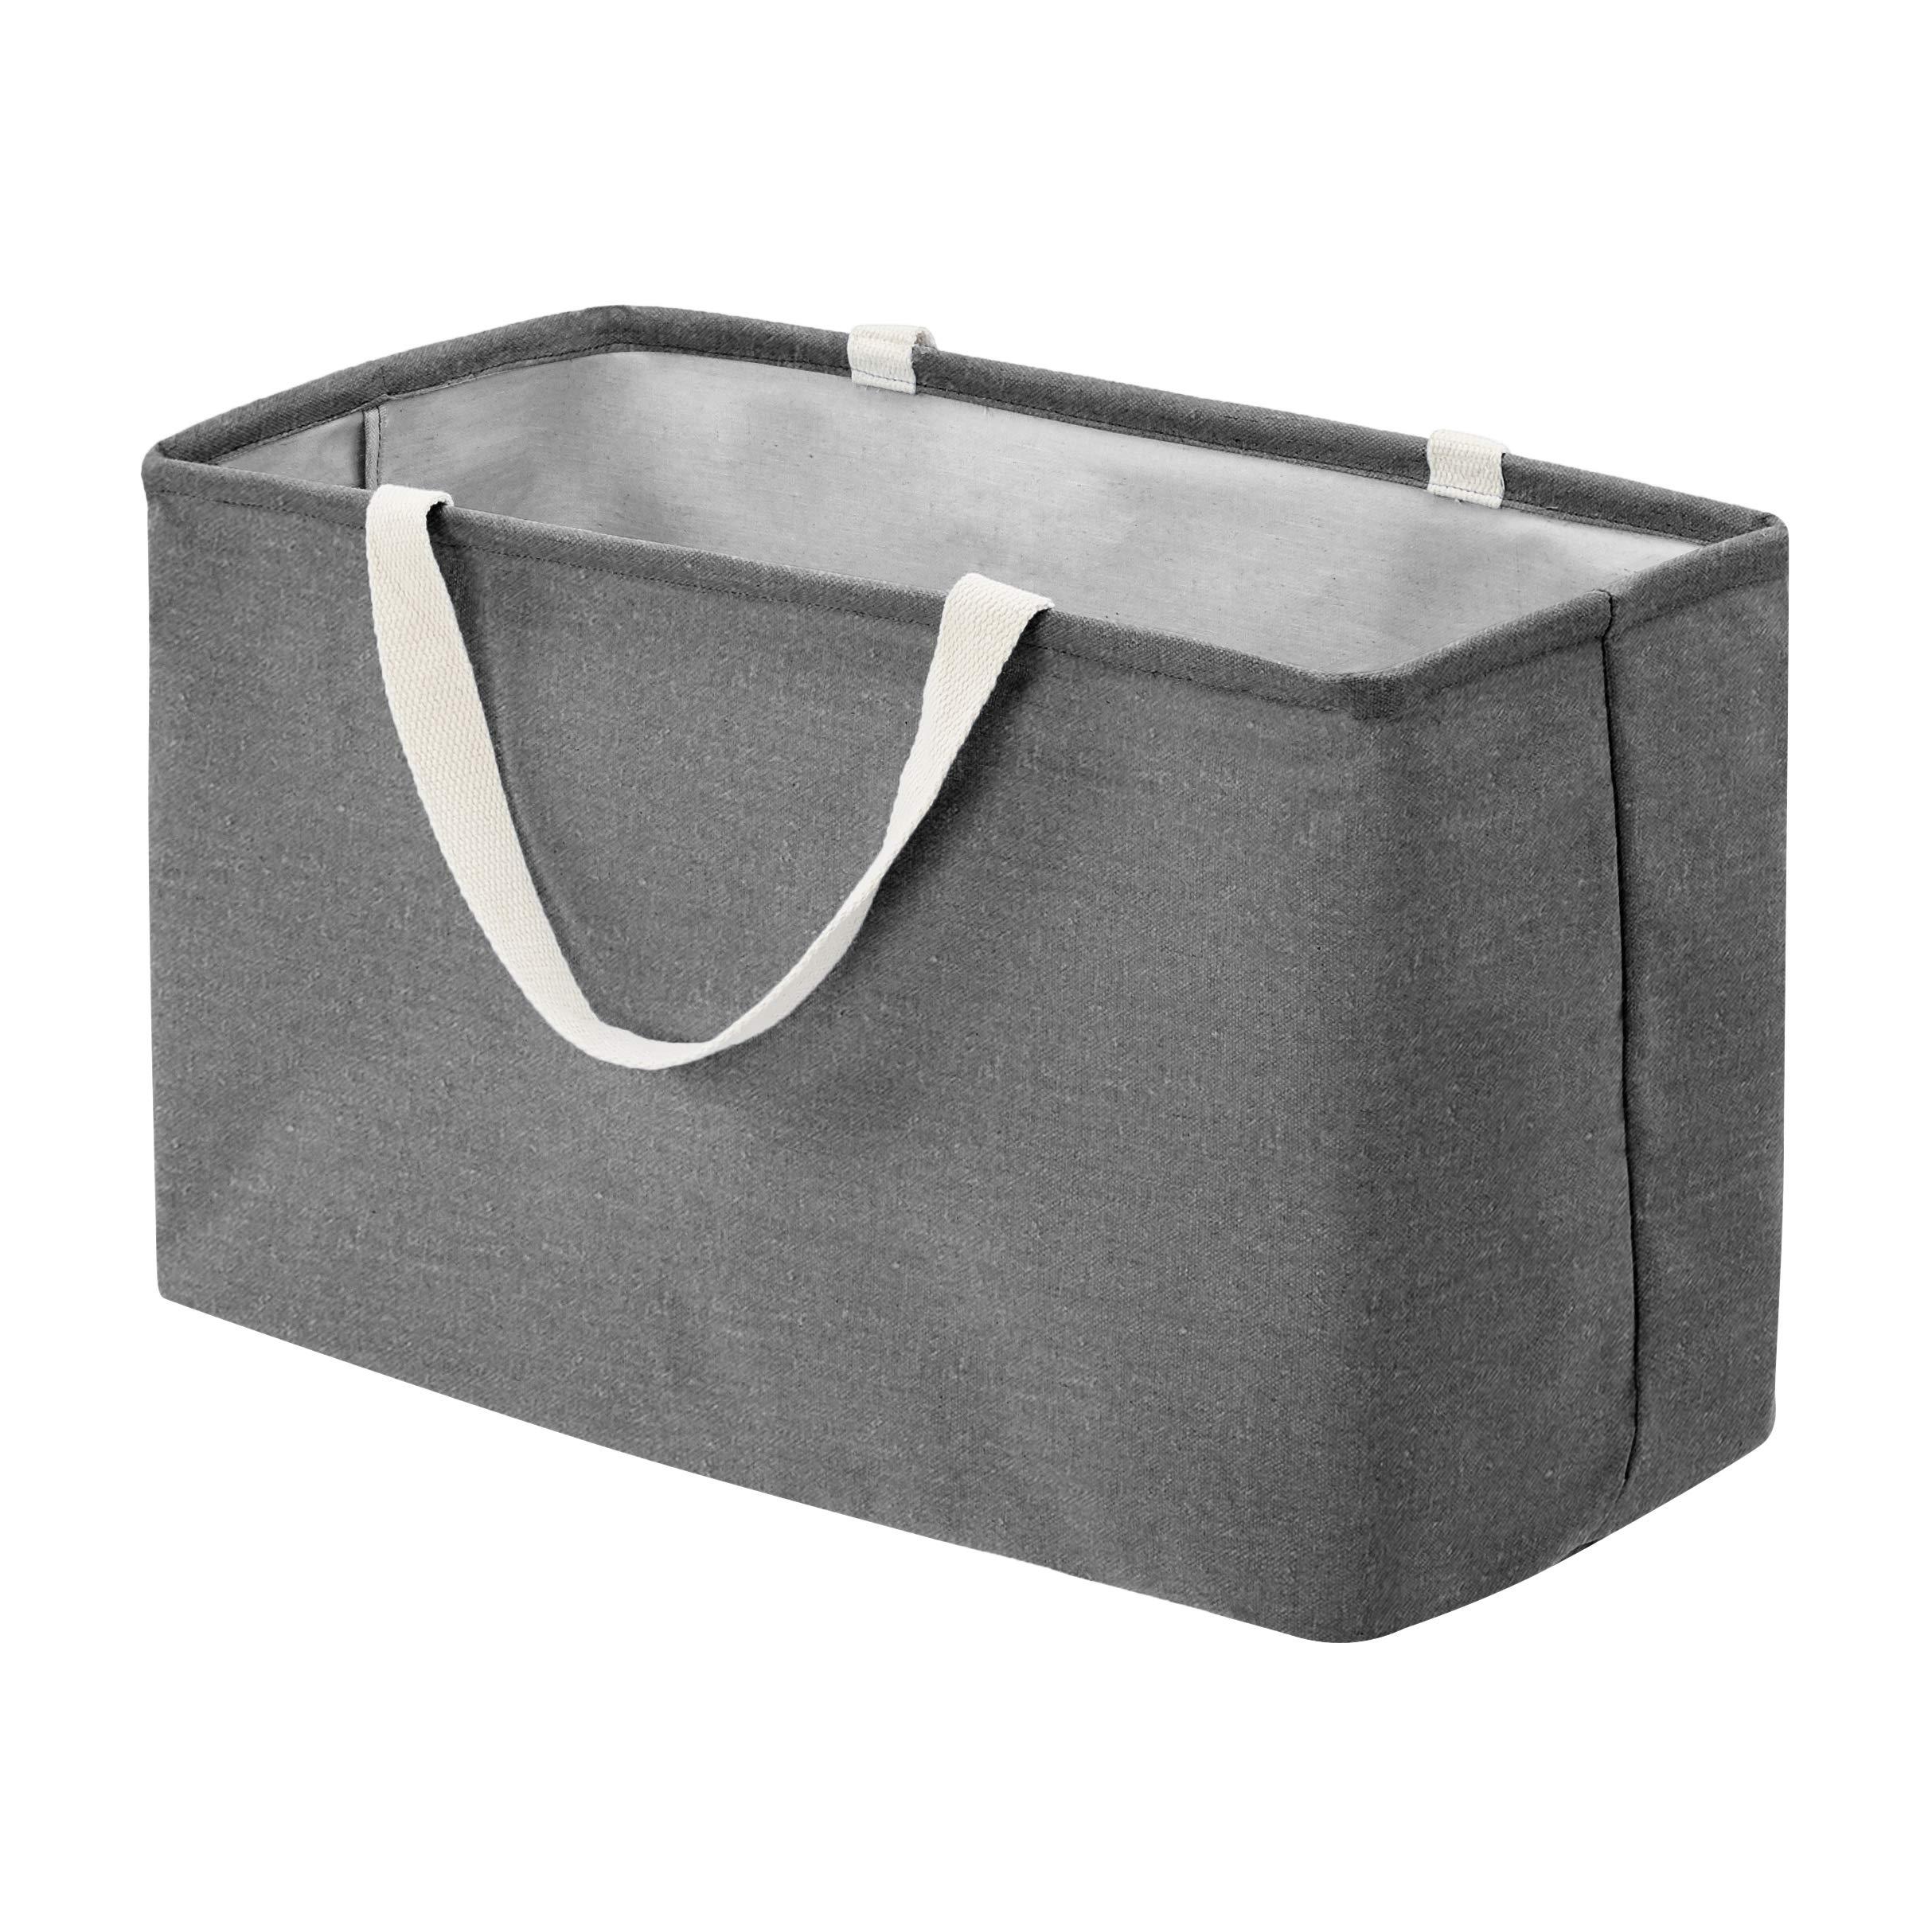 Amazon Basics Fabric Storage Bin - Large Rectangle, Charcoal Grey